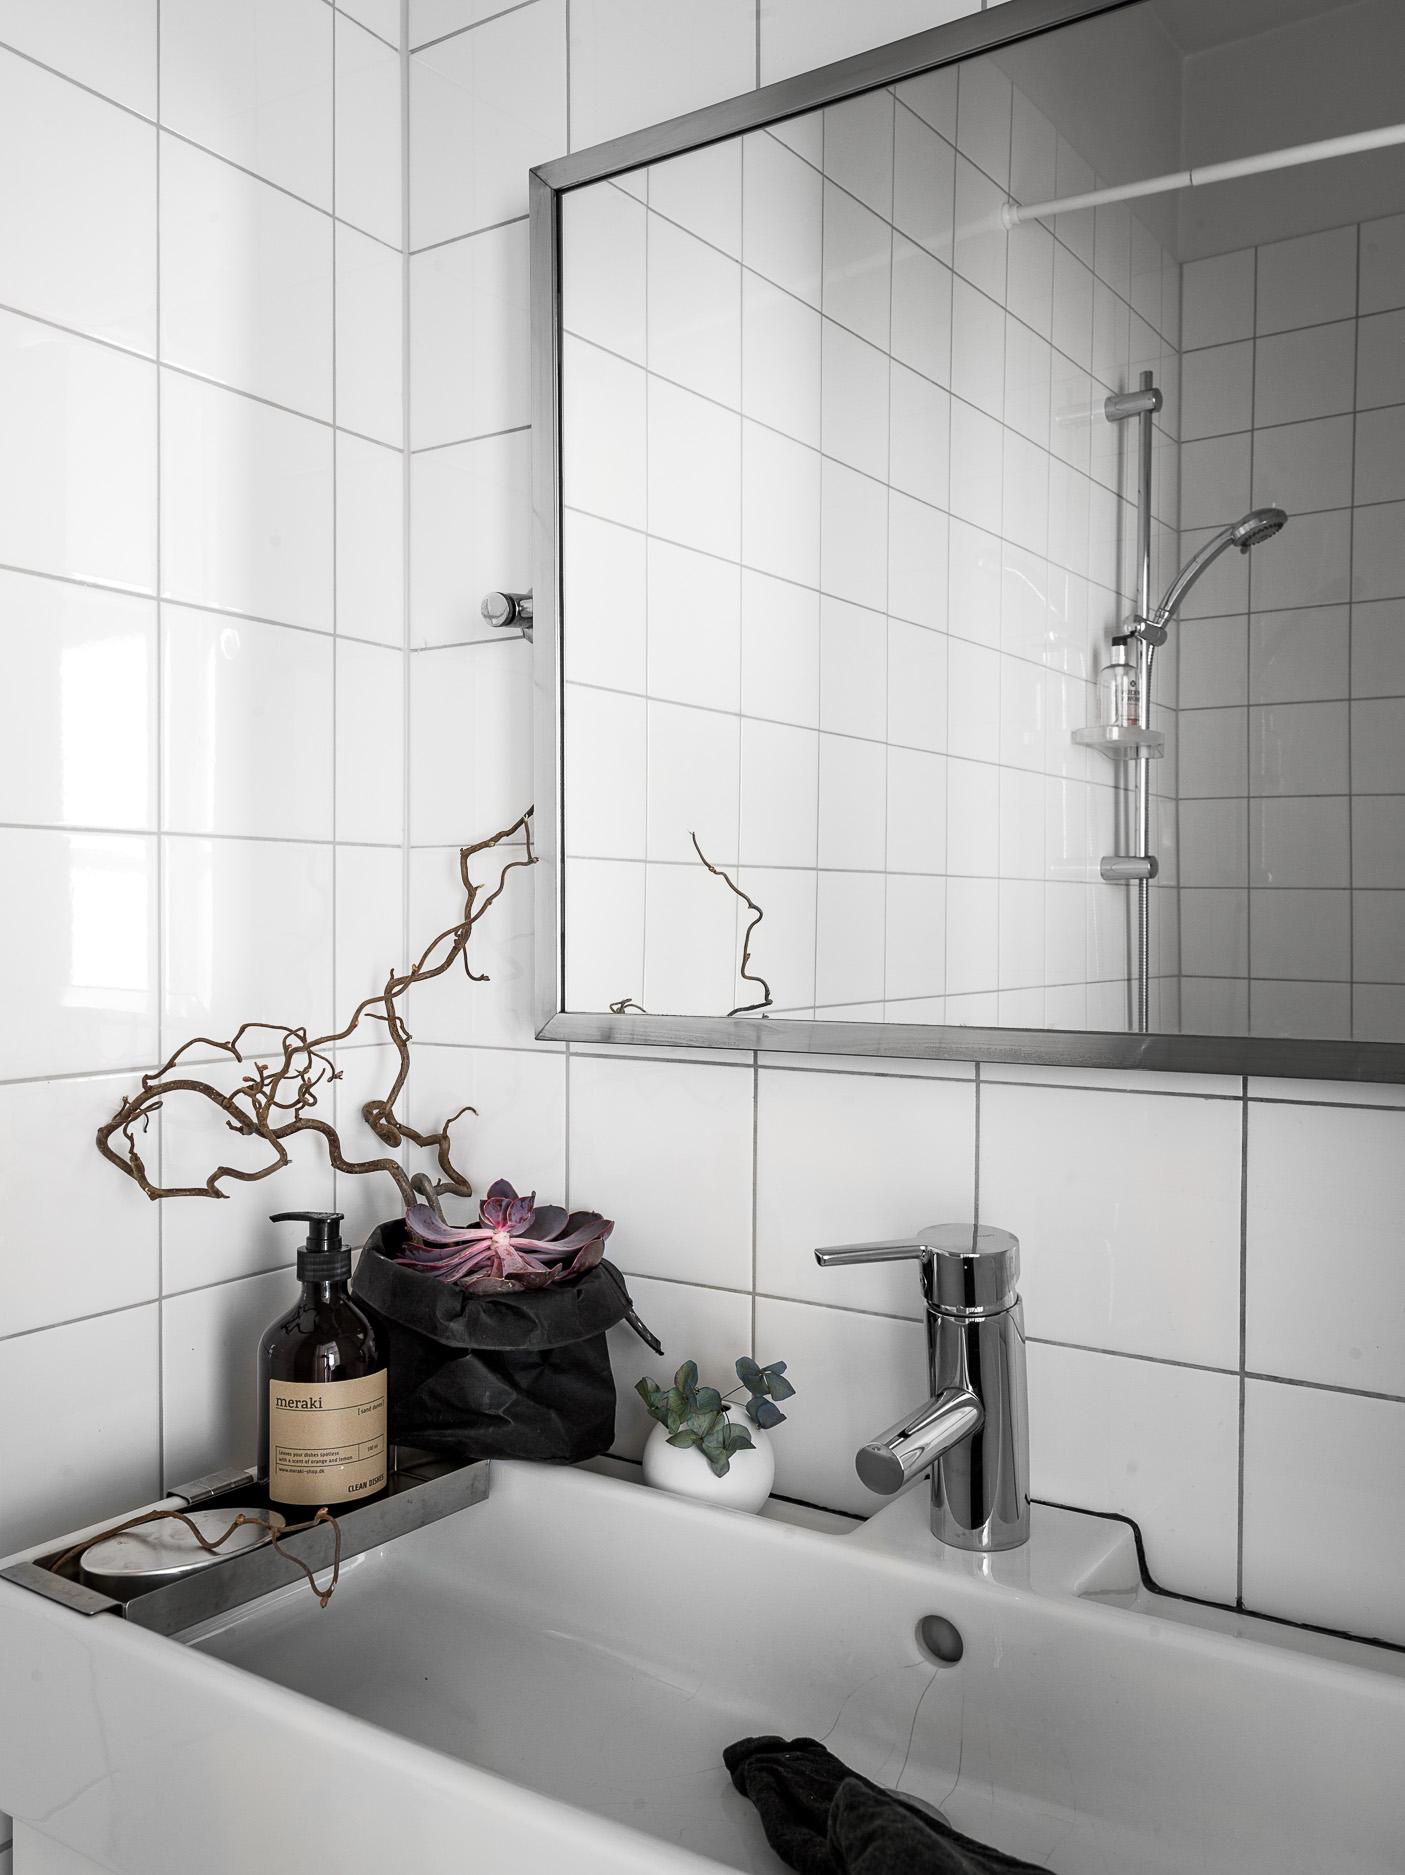 санузел душ раковина комод смеситель зеркало плитка